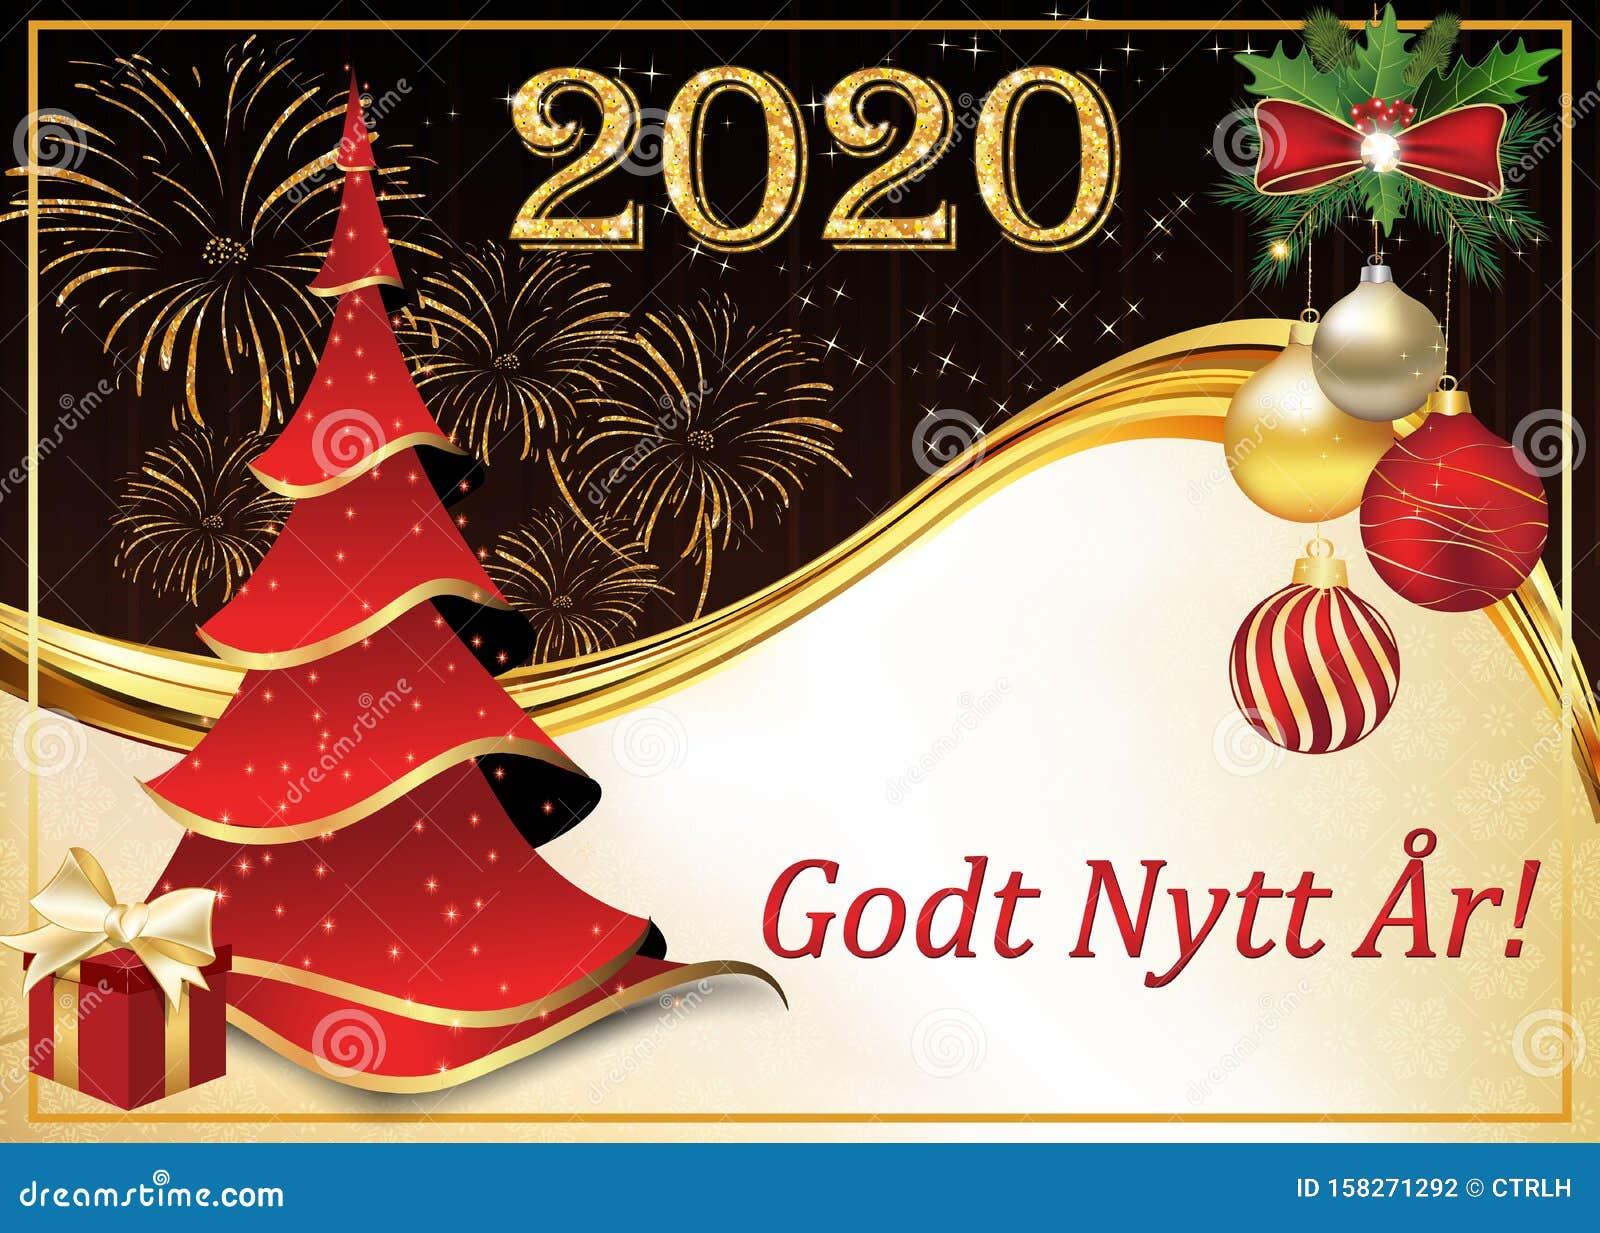 Happy New Year - Corporate Greeting Card In Norwegian ...